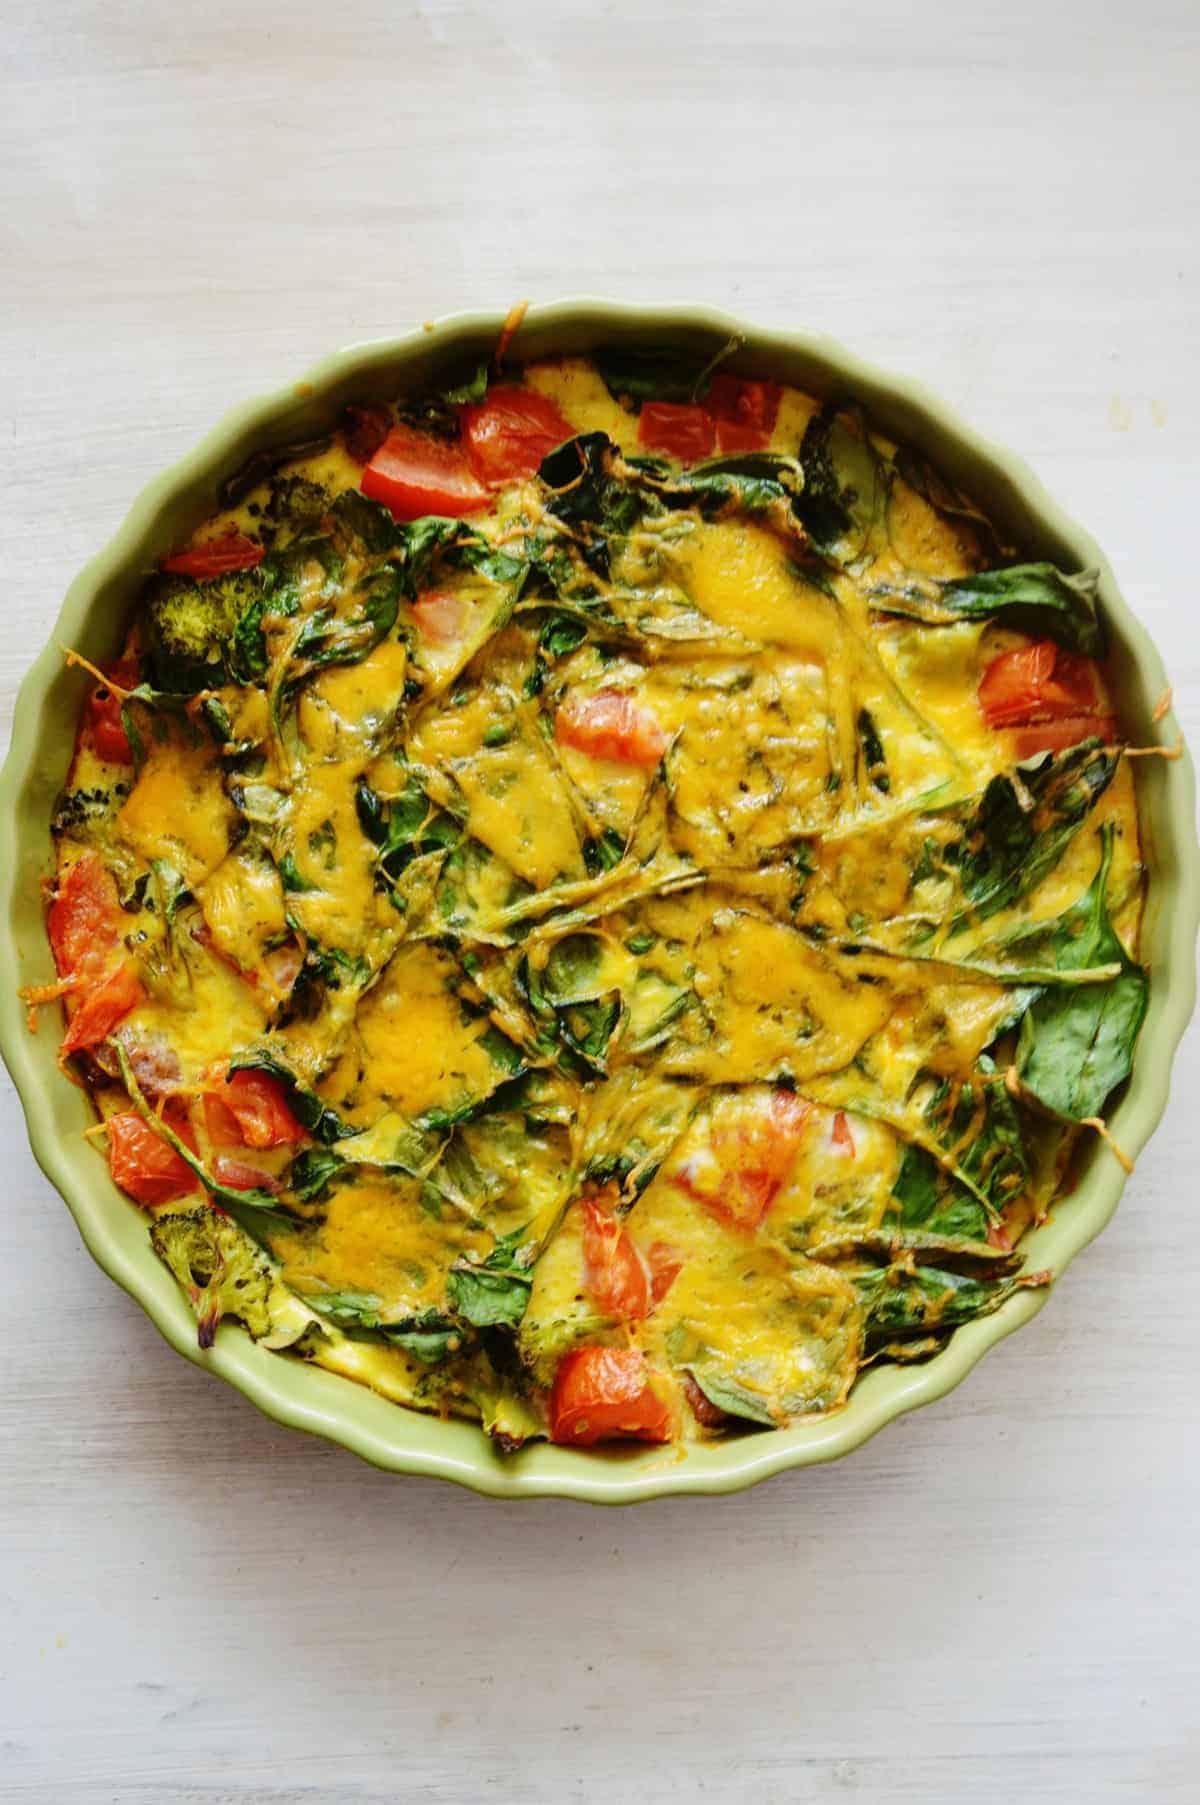 Breakfast Casserole Recipes For A Crowd